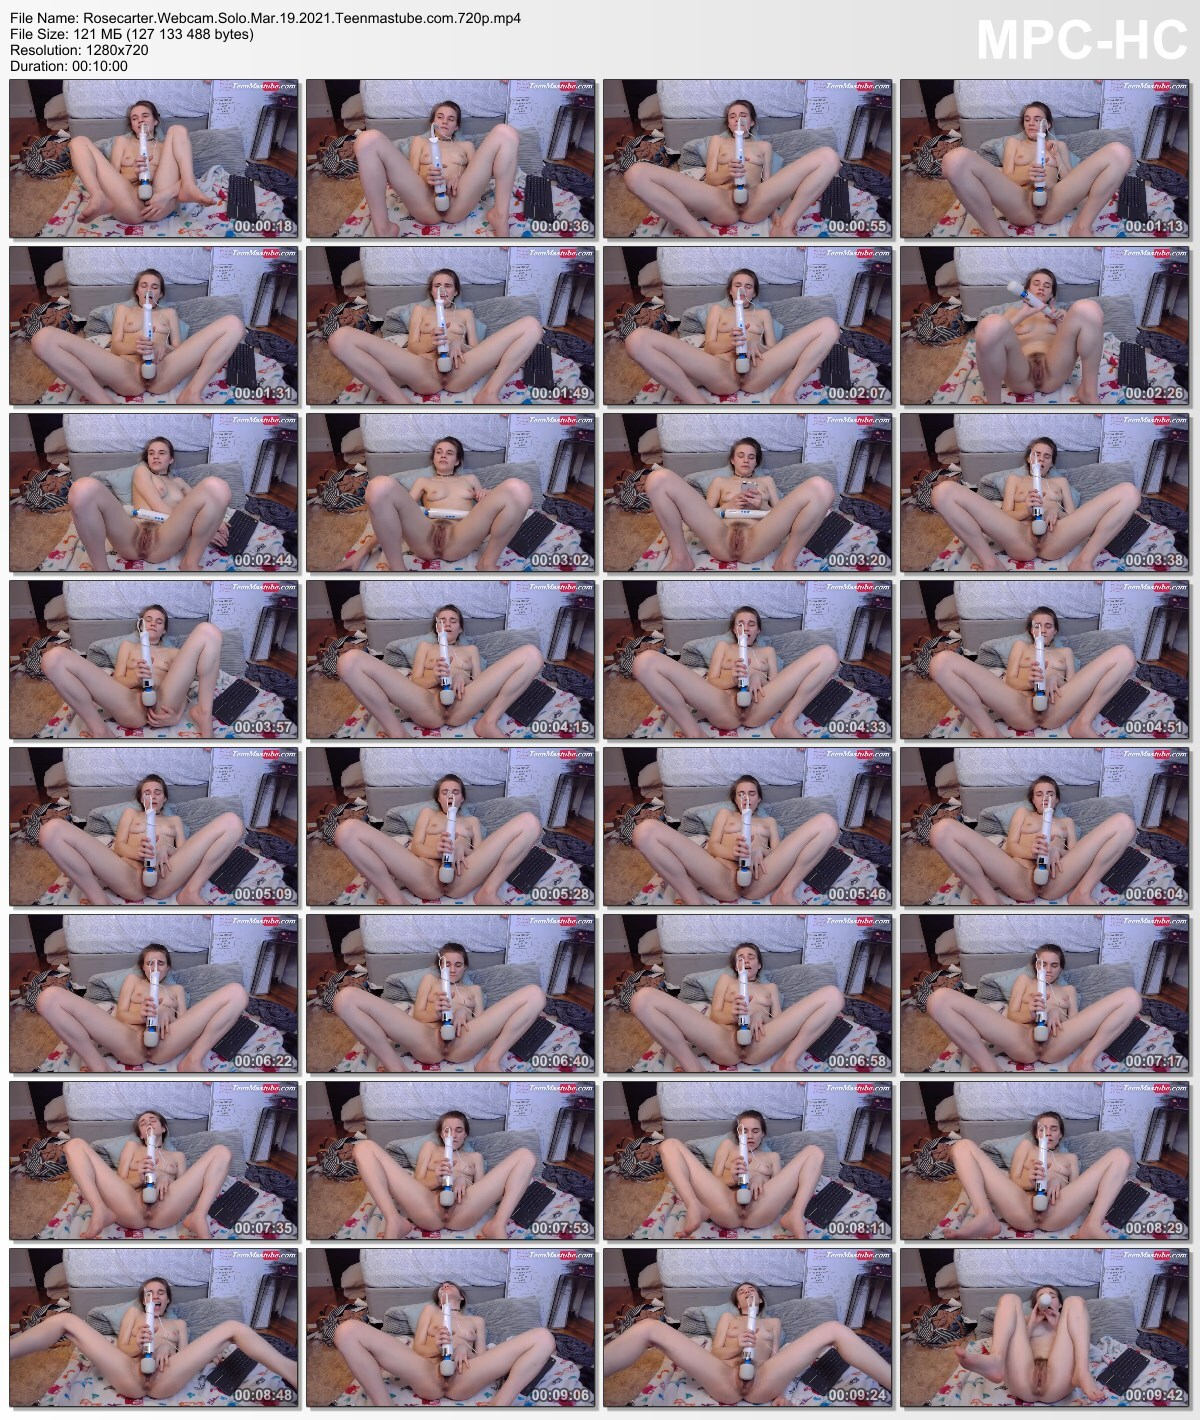 Rosecarter.Webcam.Solo.Mar.19.2021.Teenmastube.com.720p.mp4_thumbs.jpg